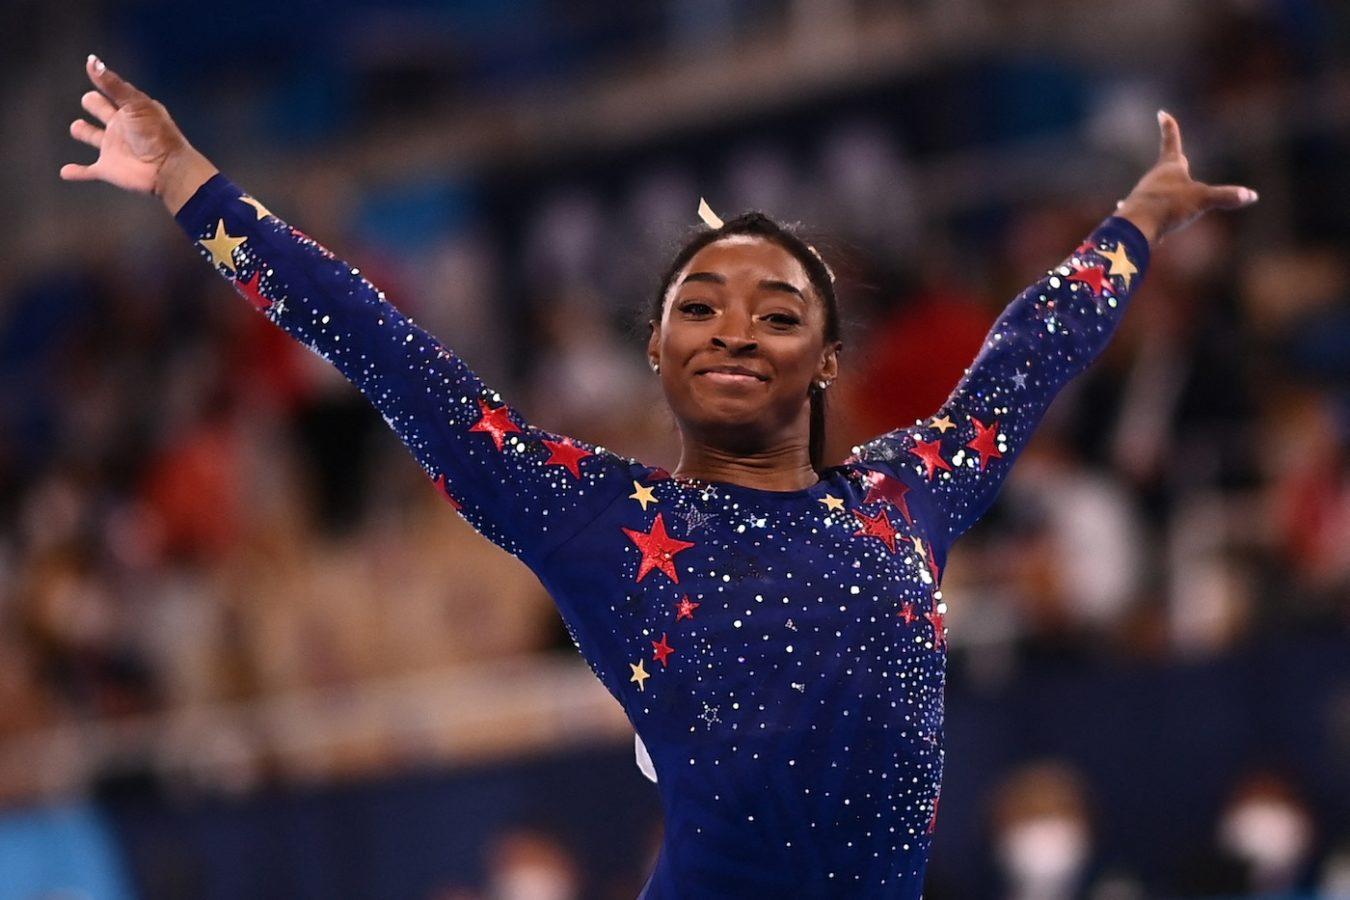 Beyond Gymnastics, Simone Biles is Inspiring Change Around Mental Health